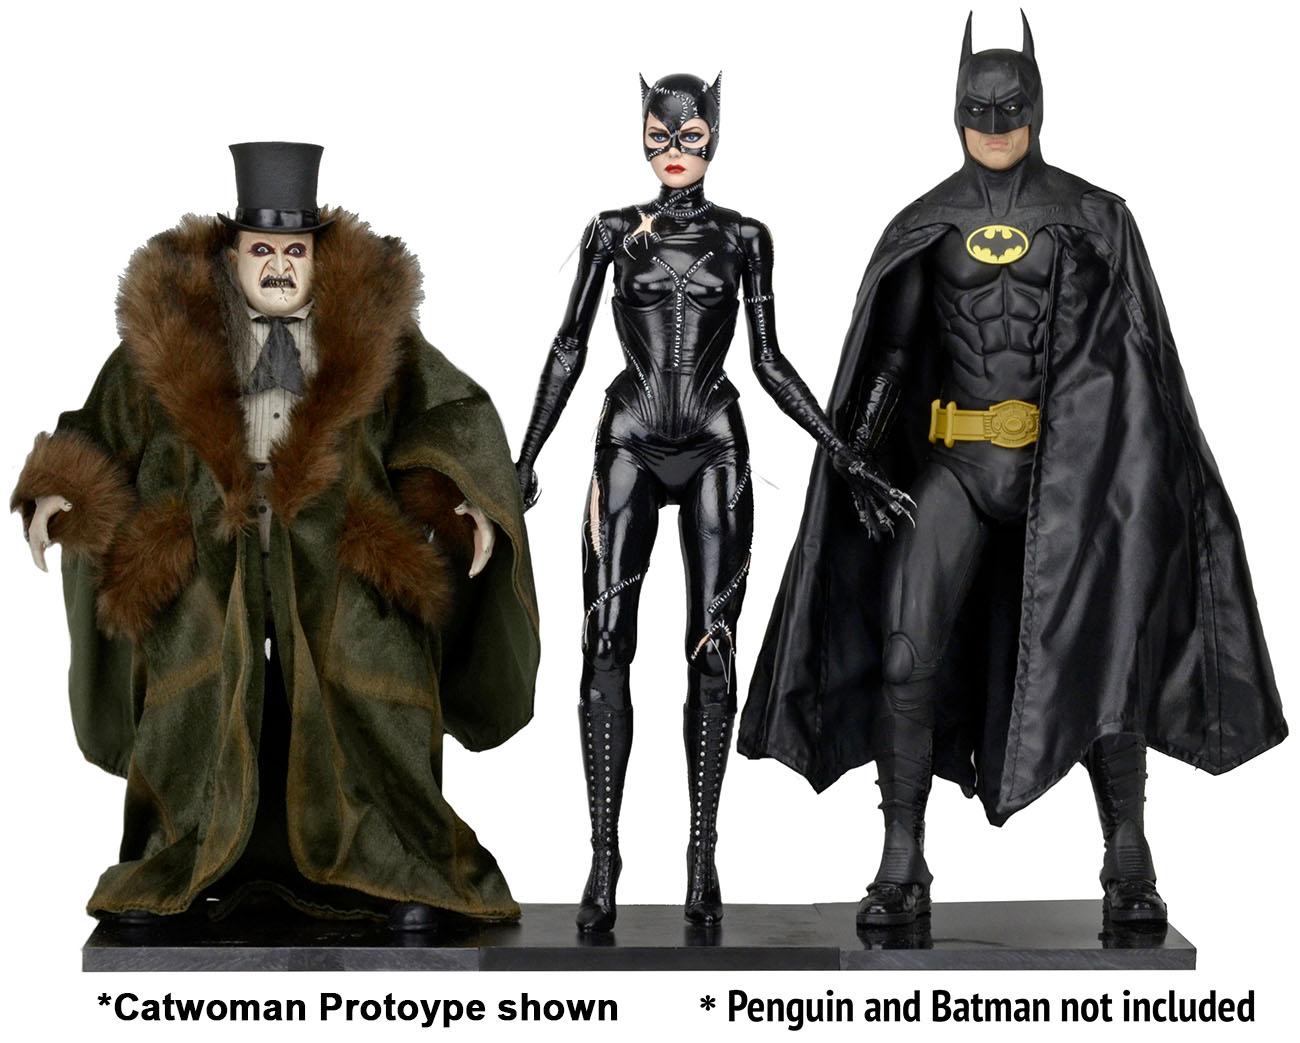 NECA Toys Batman Returns 1/4″ Scale Catwoman Figure On Amazon & eBay Storefront